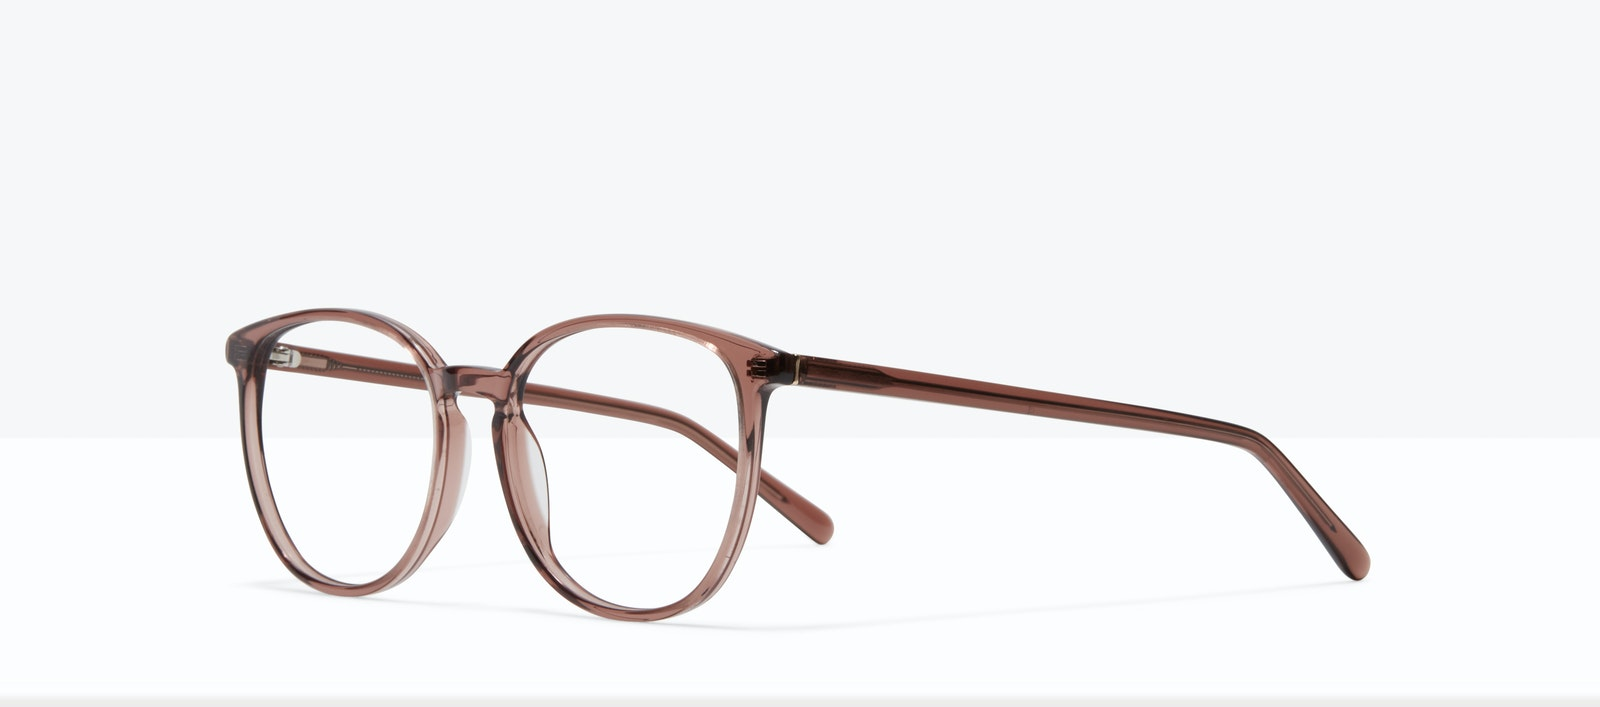 Affordable Fashion Glasses Round Eyeglasses Women Femme Libre S Catherine Tilt